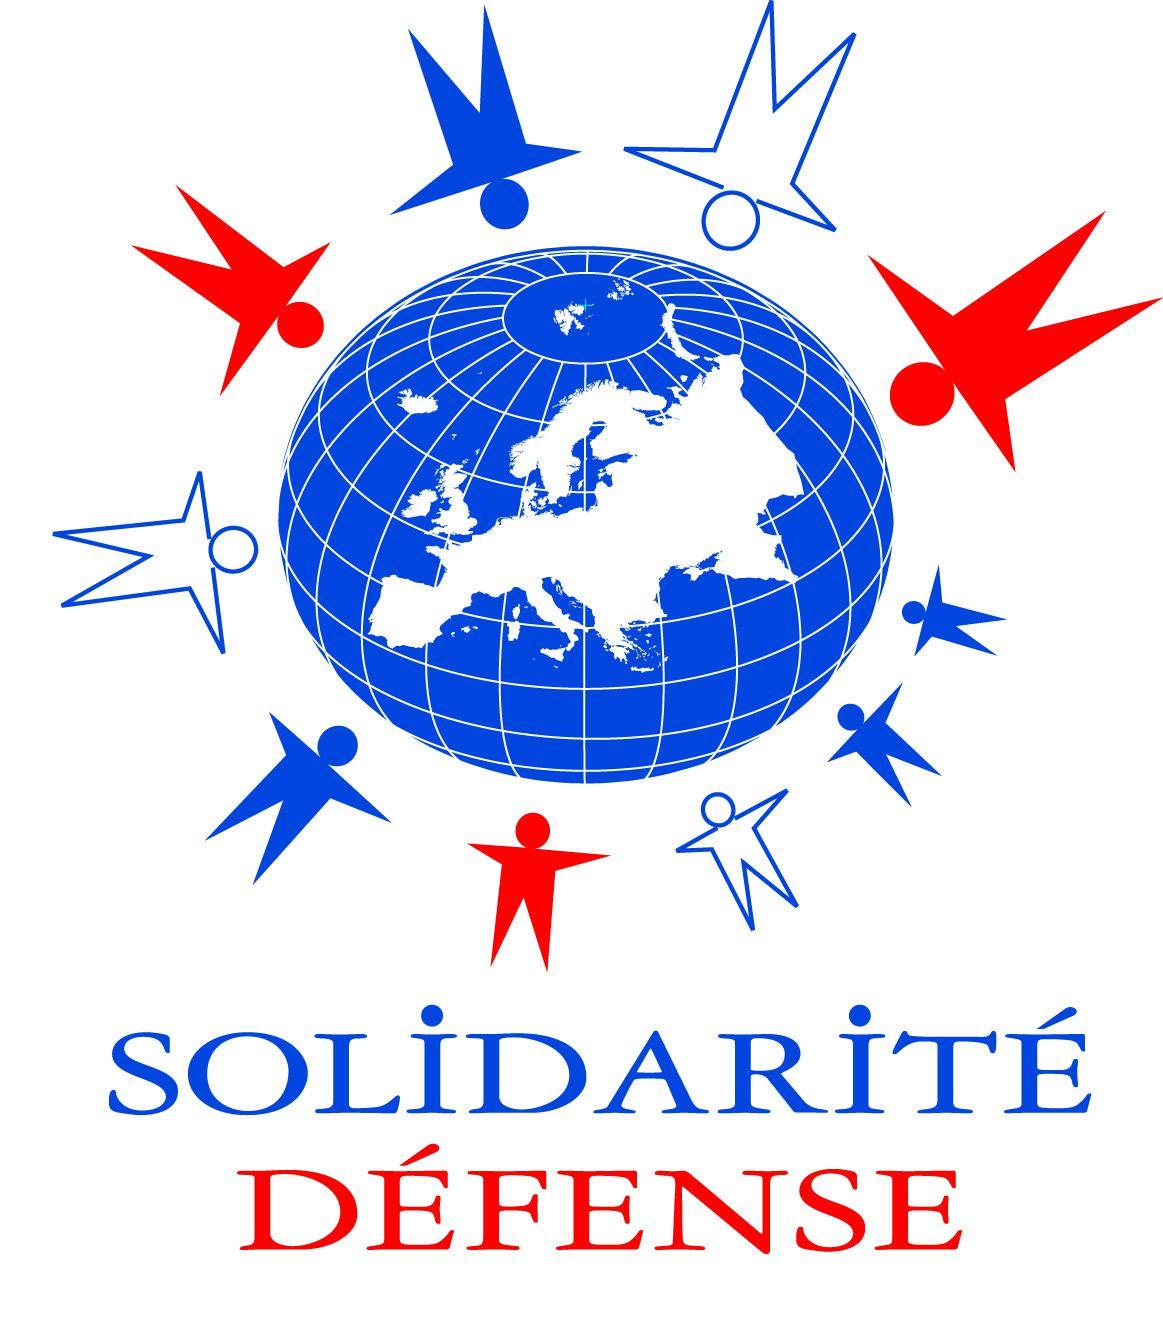 Solidarité Défense.